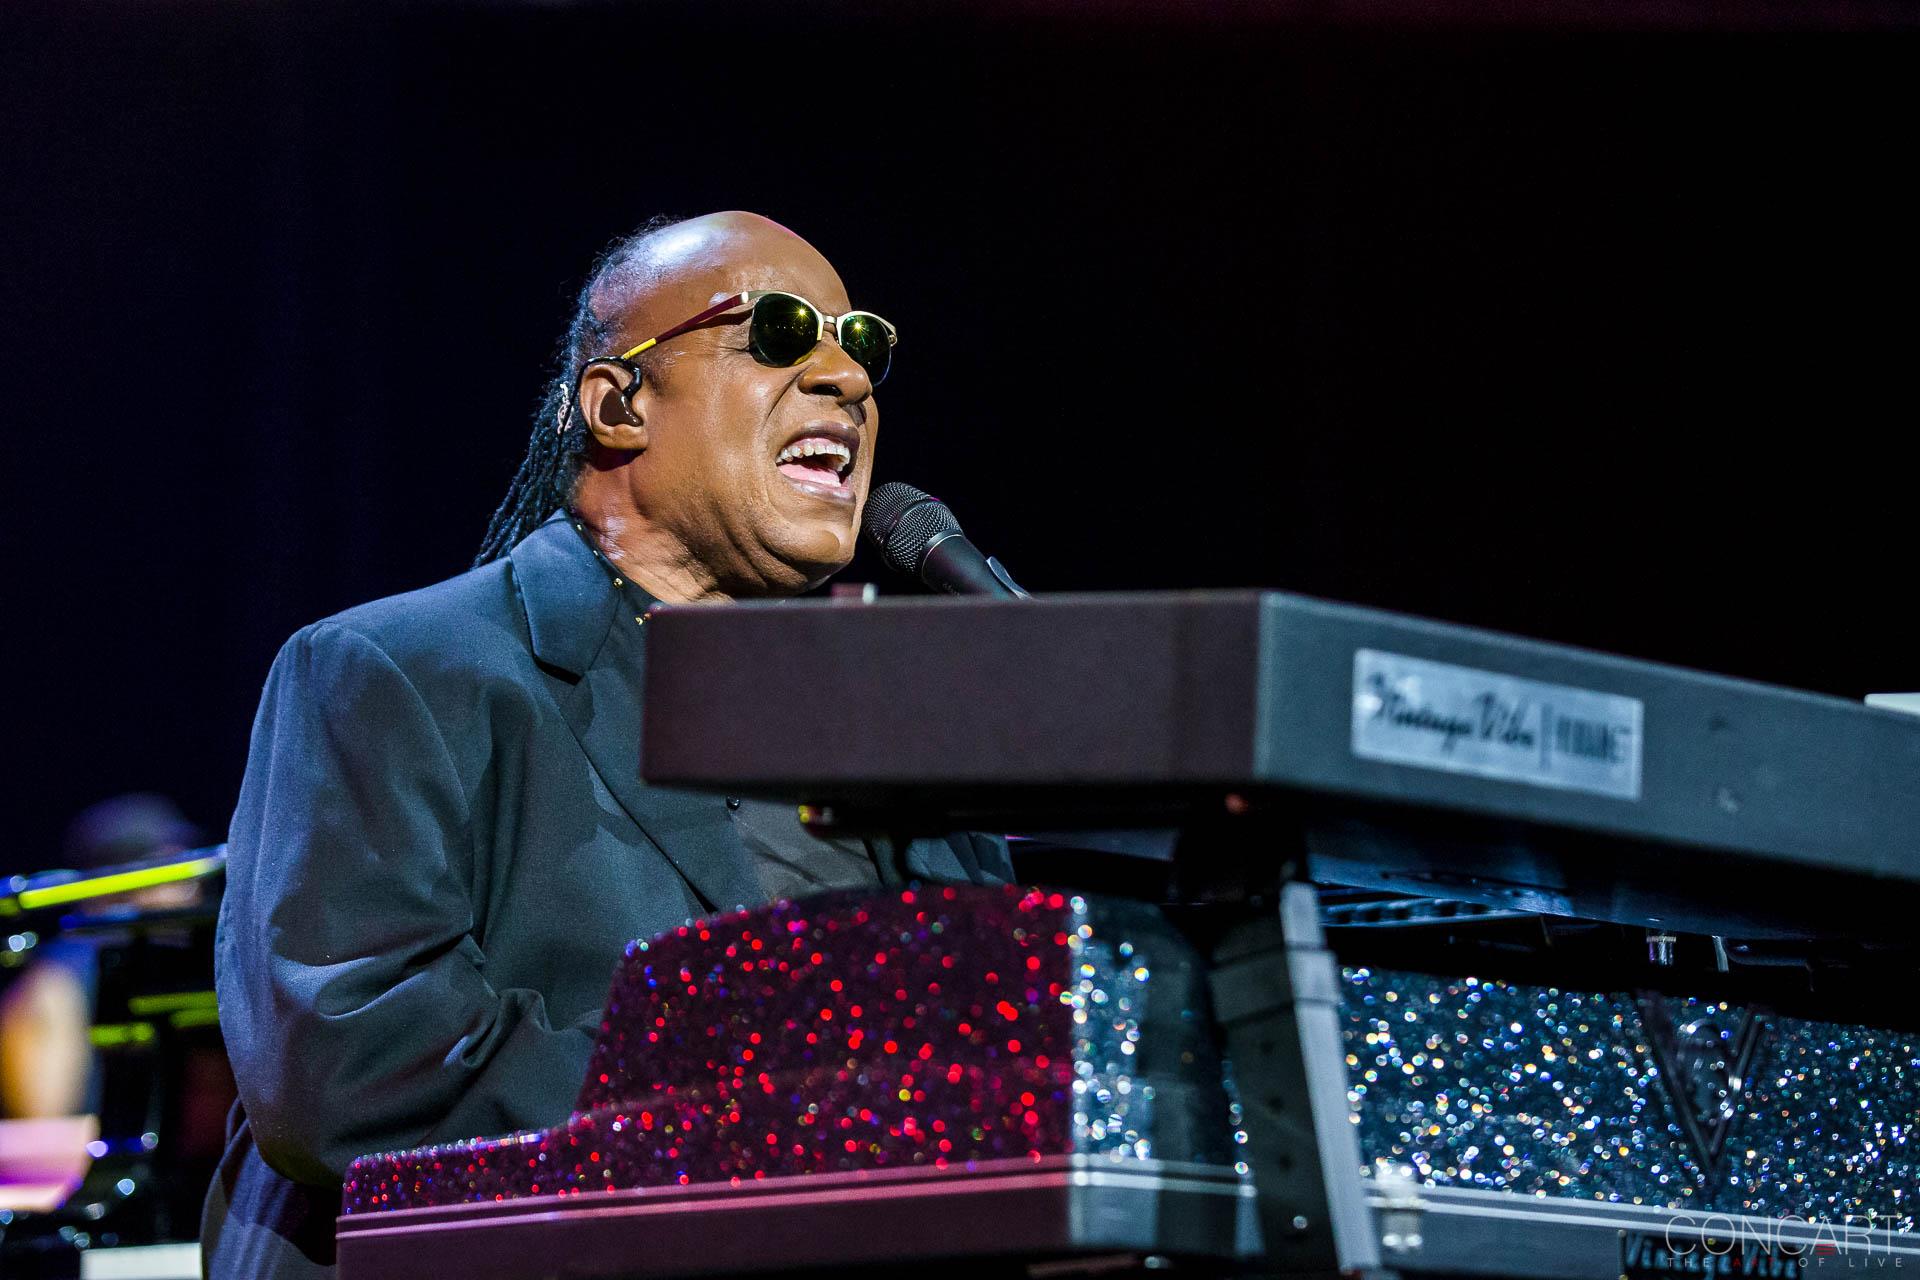 Stevie Wonder photo by Tyson White 5